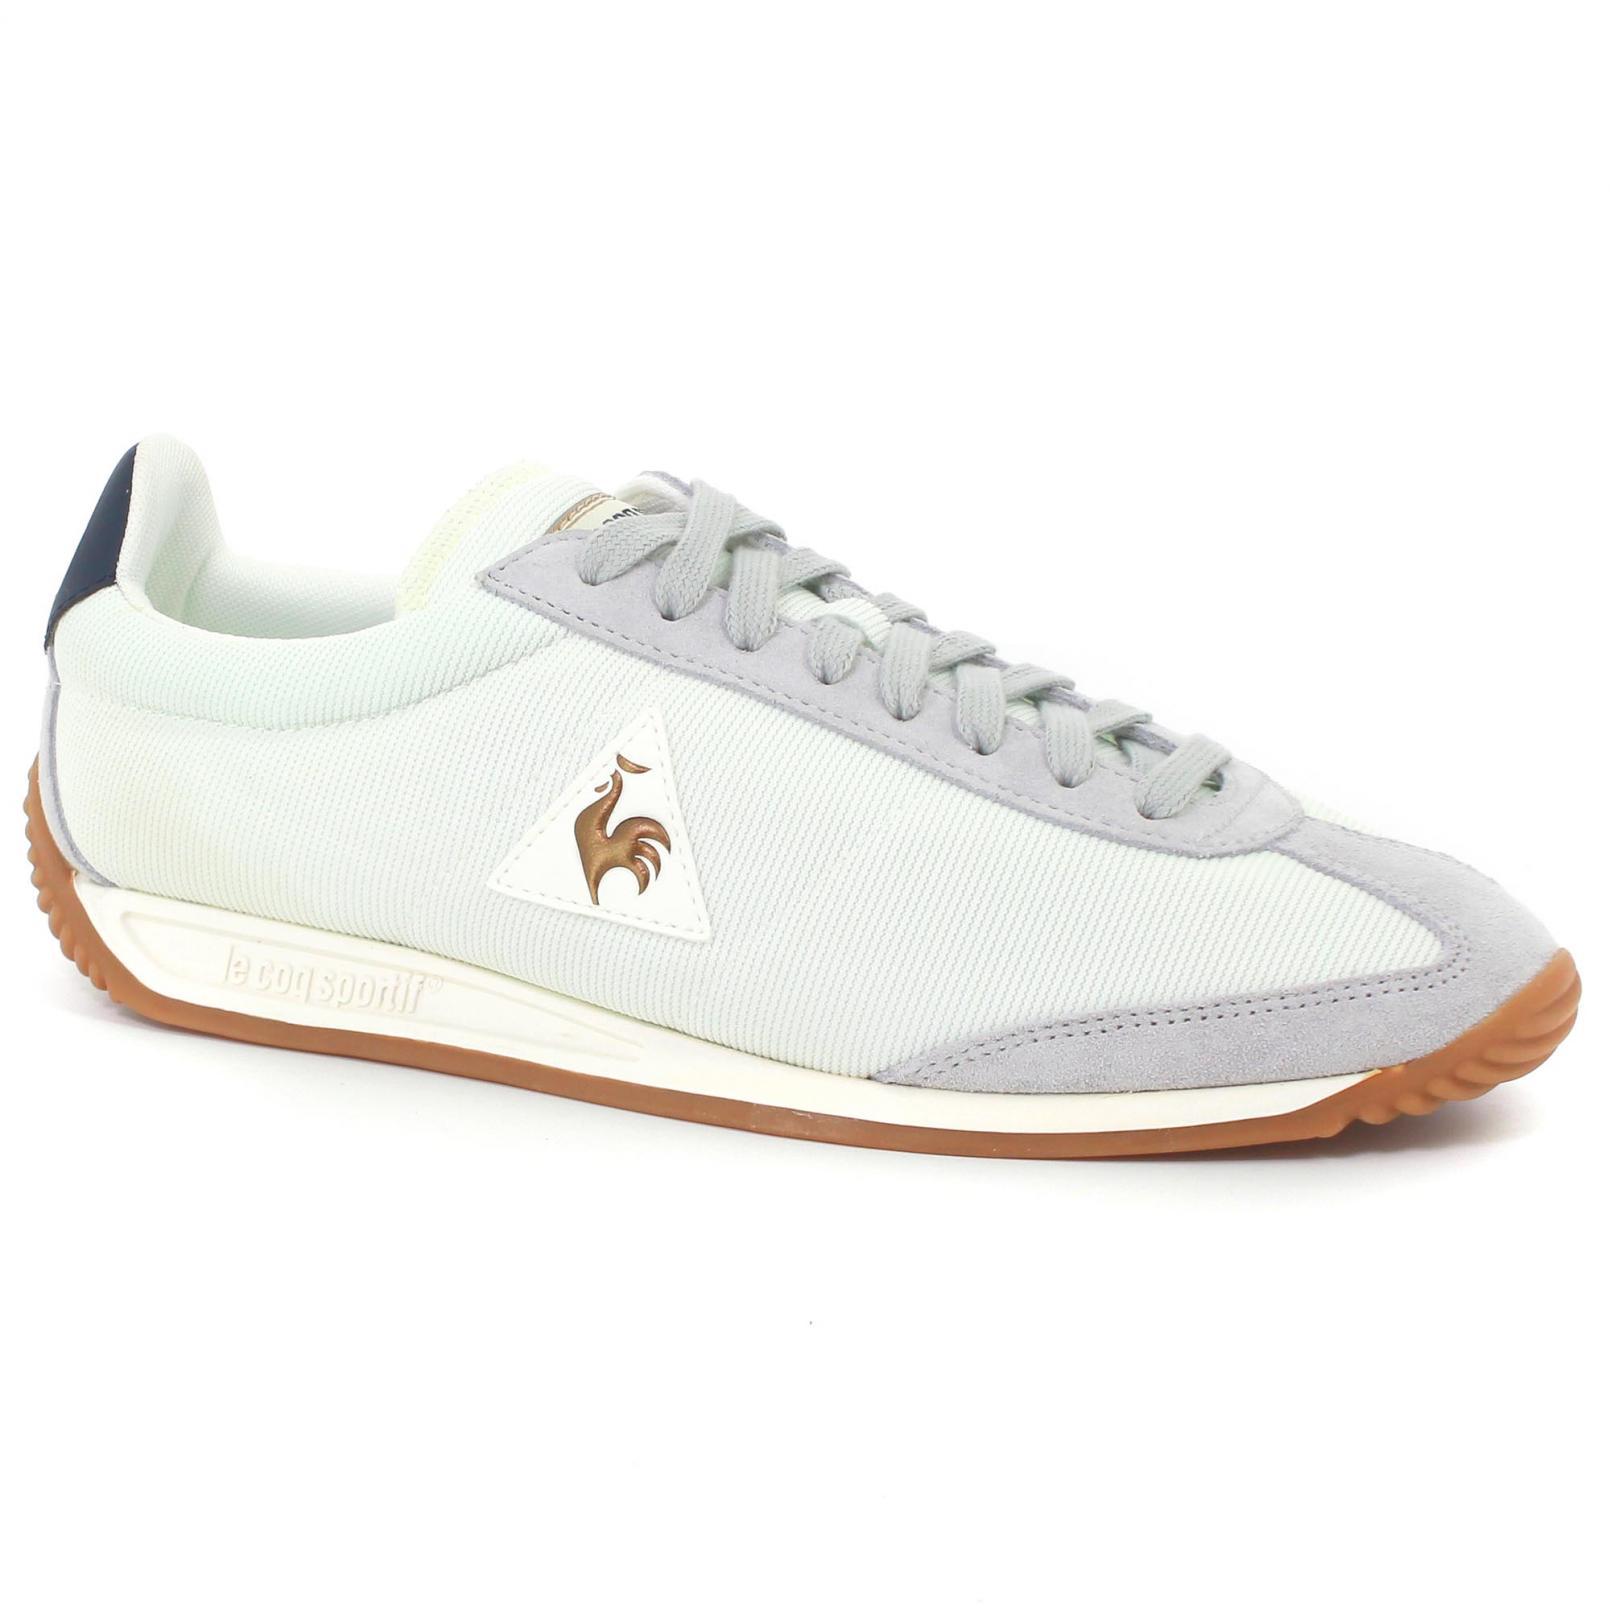 Shoes – Le Coq Sportif Quartz Gum Cream/Grey